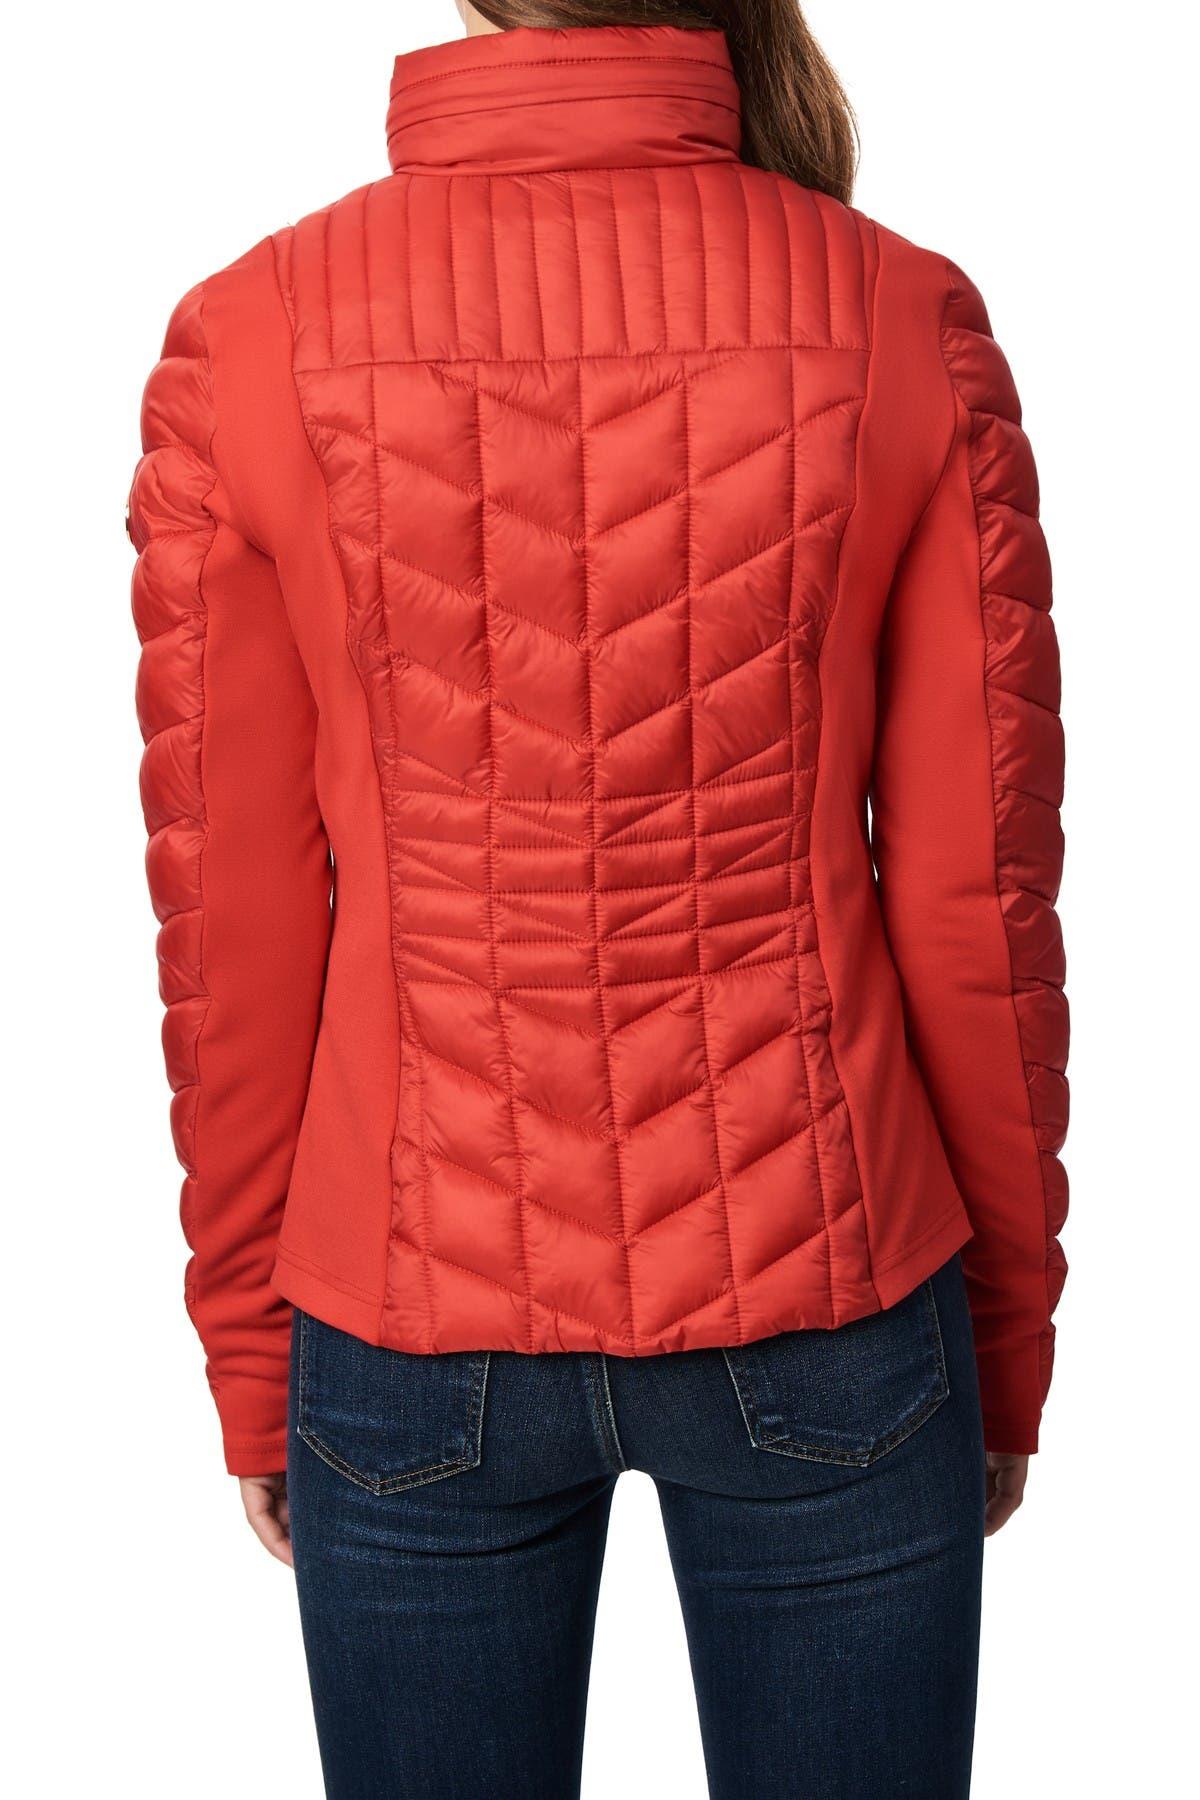 Bernardo Woven Quilted Jacket